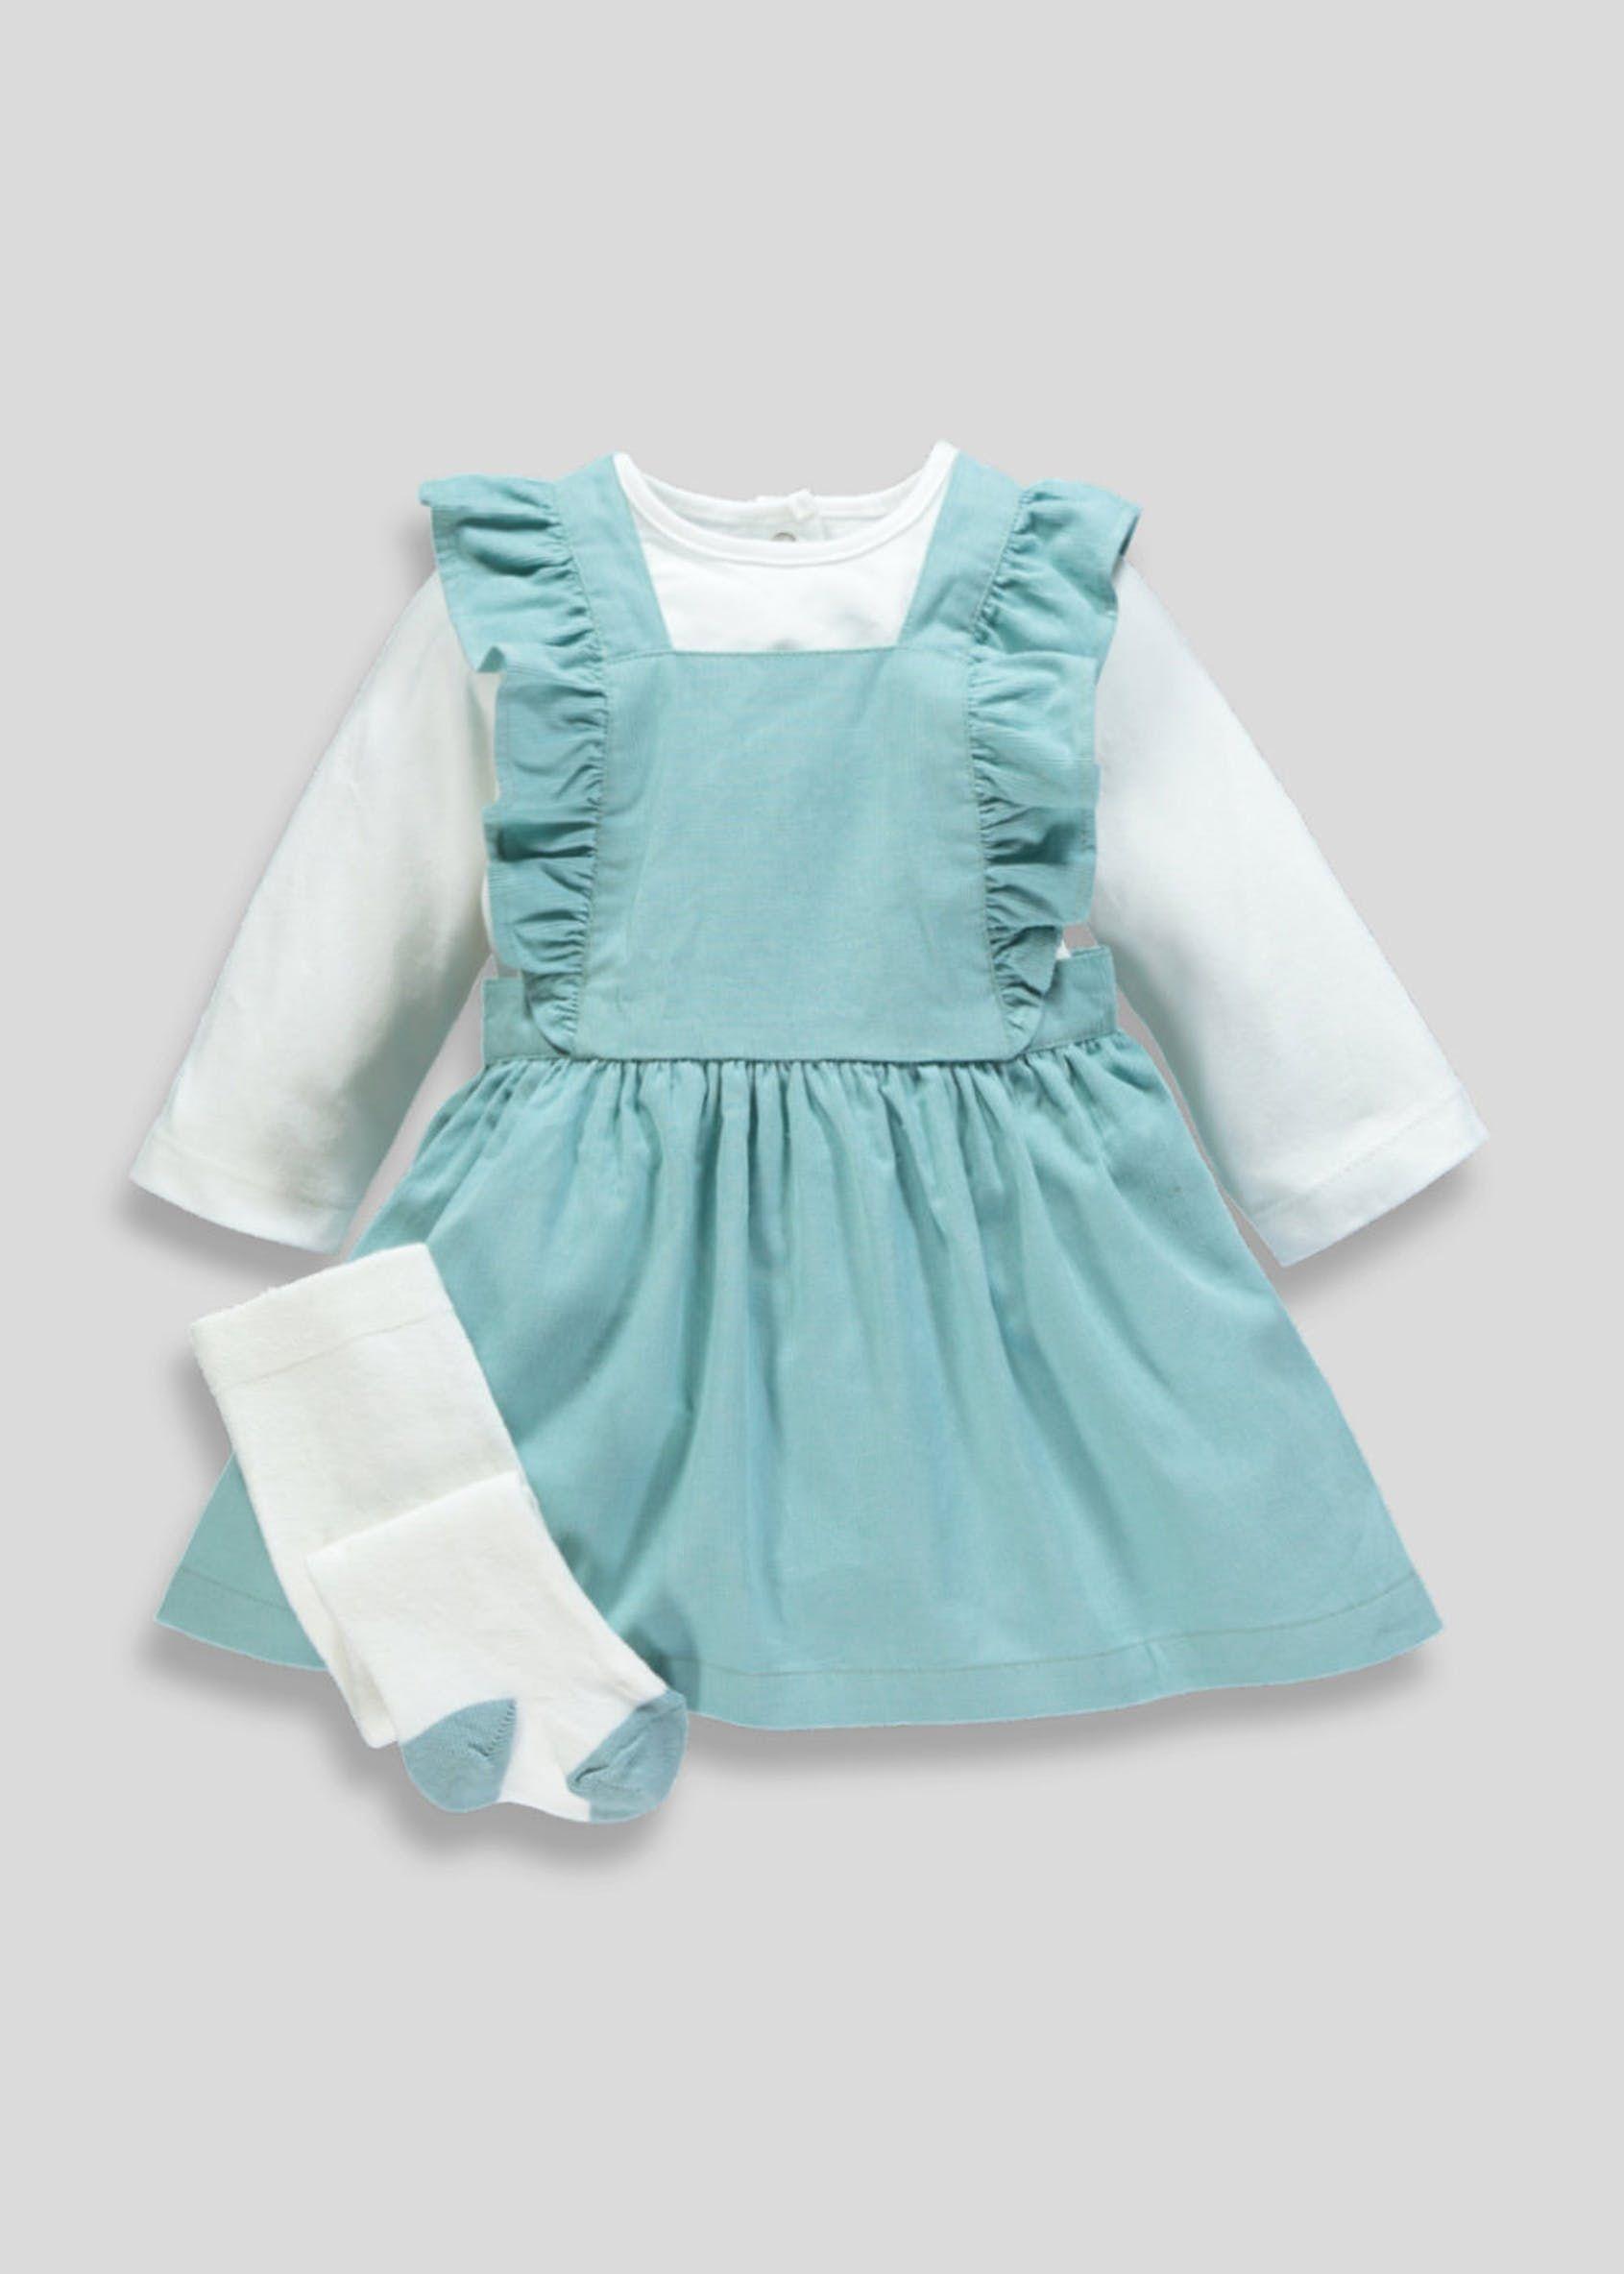 341da4e0b135a Girls Cord Pinafore Set (Newborn-18mths) Cream Tights, Matalan, Pinafore  Dress